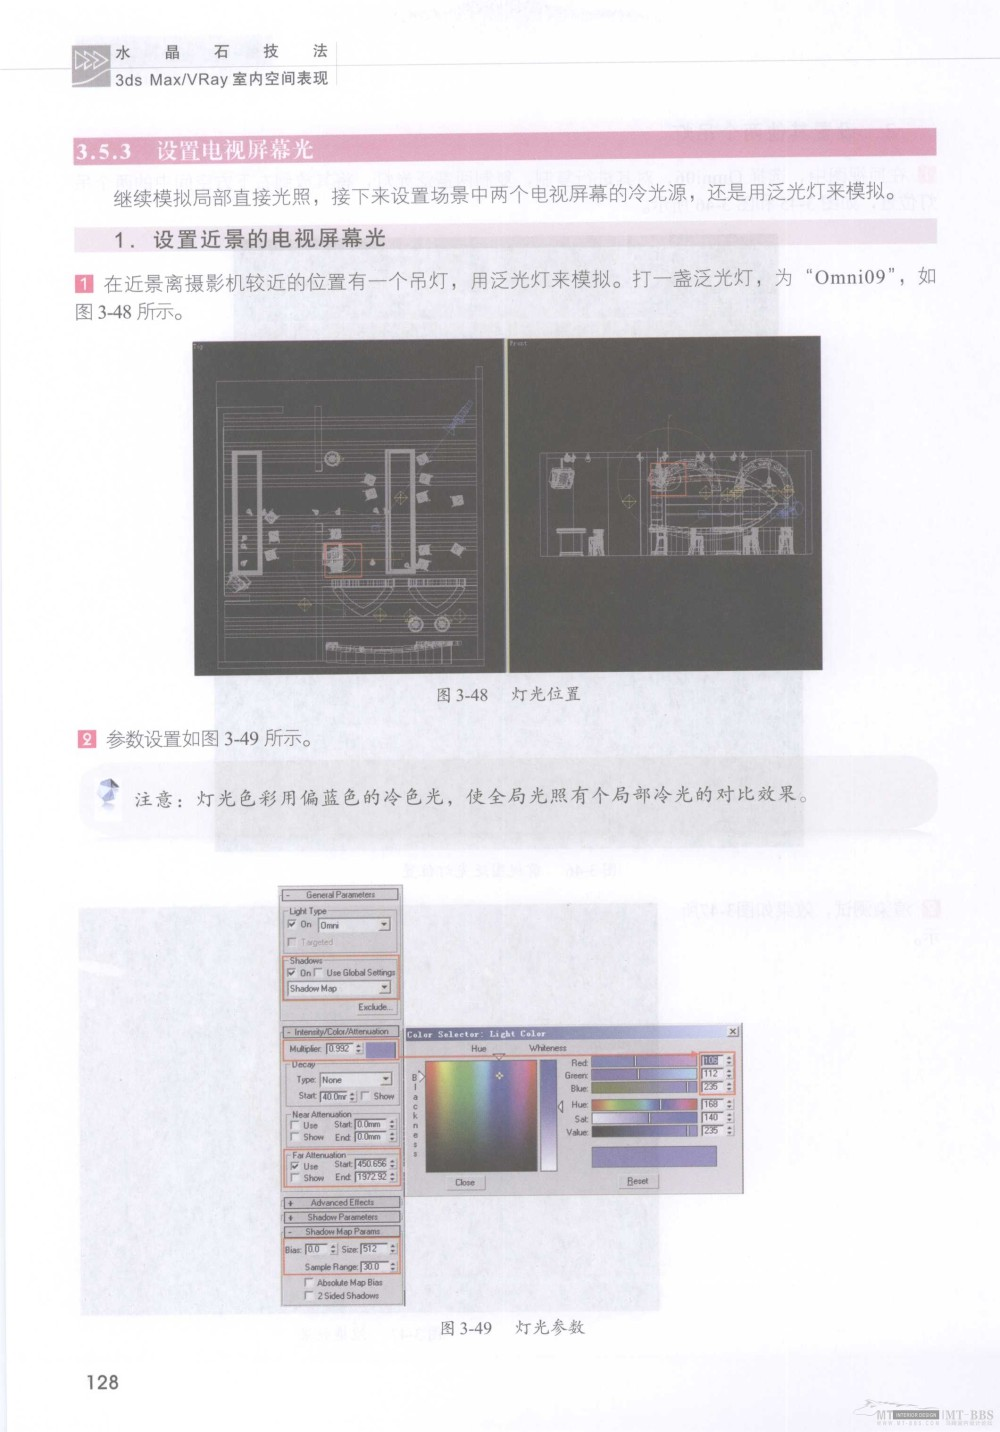 水晶石技法-3ds_Max&VRay室内空间表现_水晶石技法-3ds_Max&VRay室内空间表现_页面_134.jpg